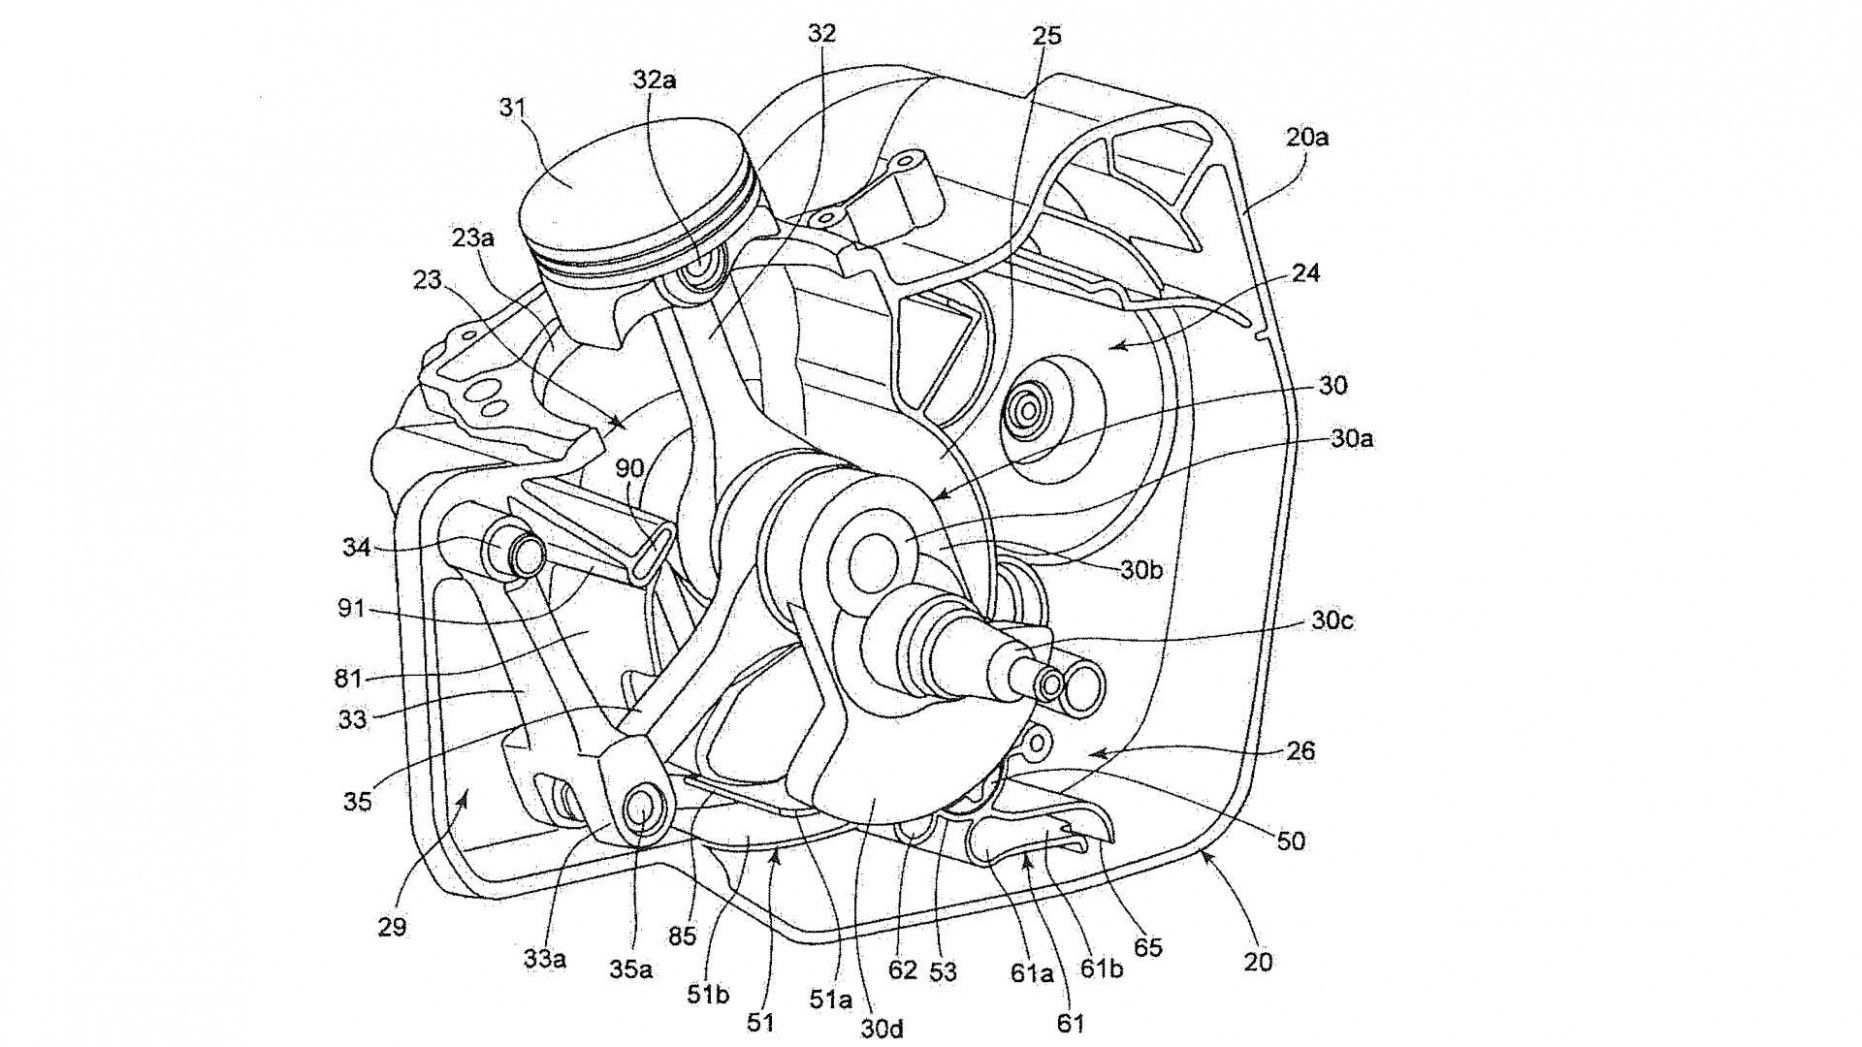 1987 Yamaha Warrior 350 Wiring Diagram